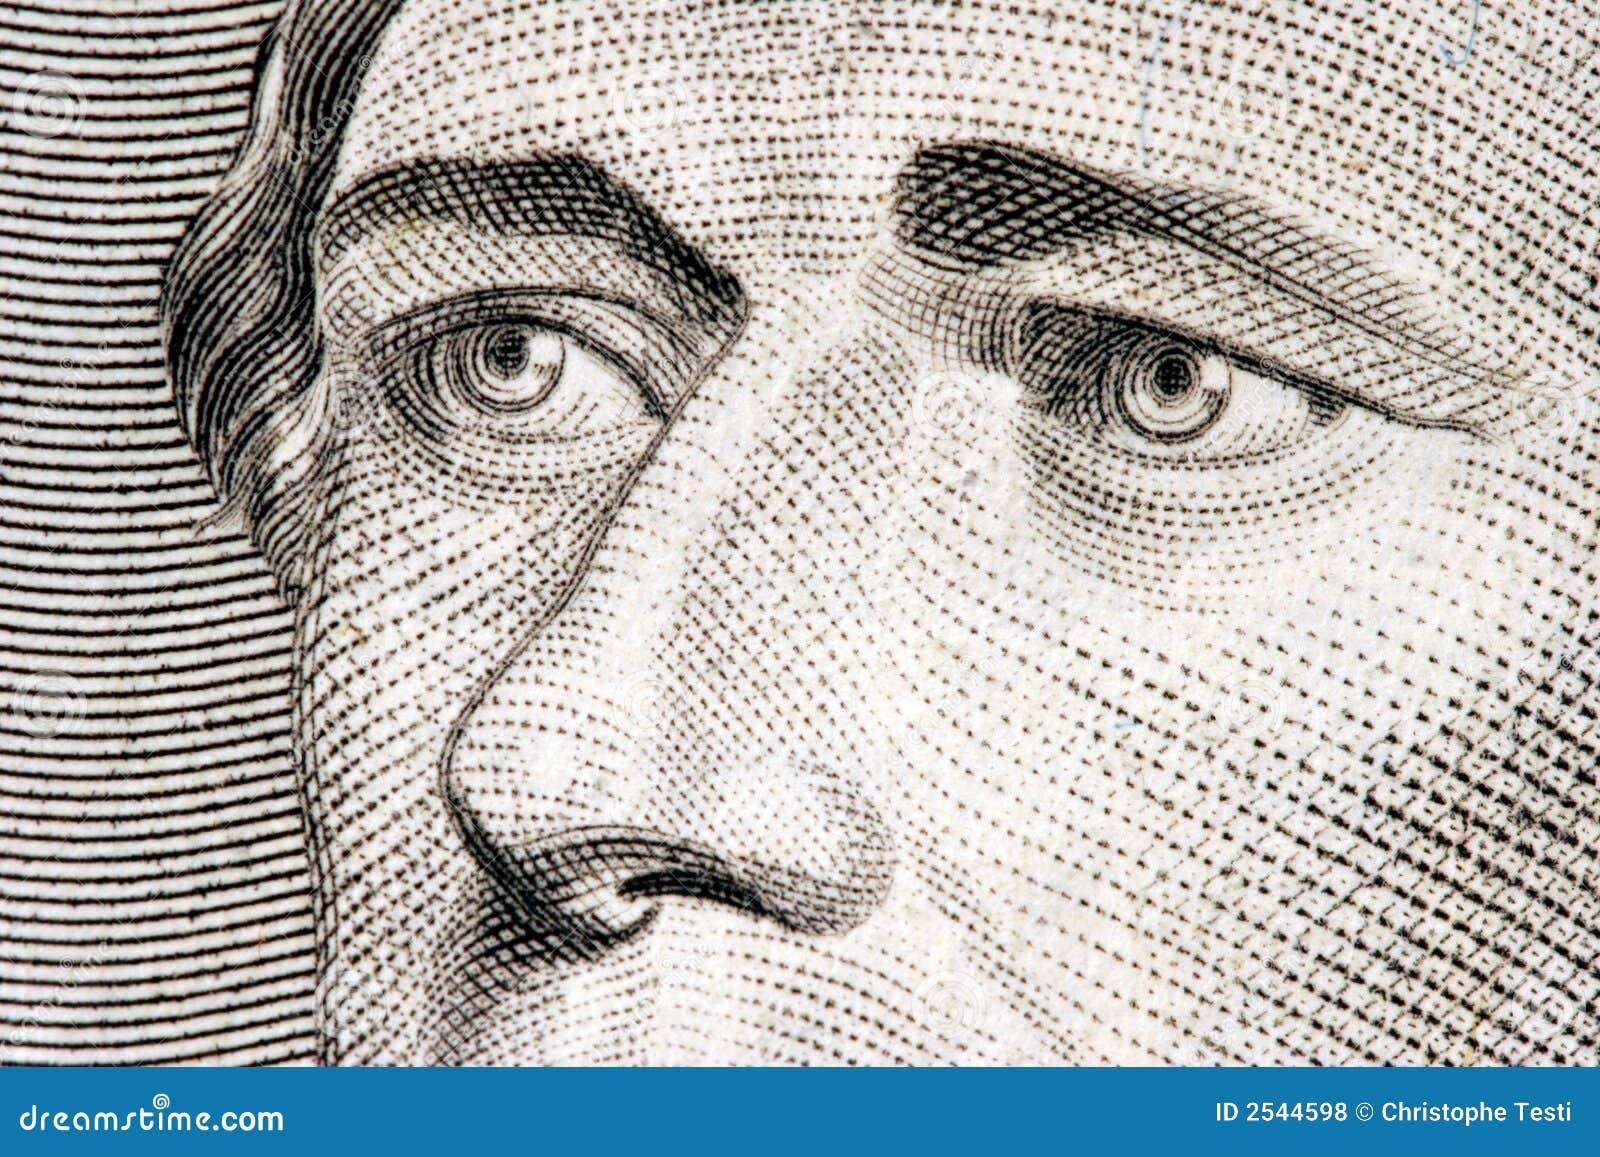 Alexander Hamilton close up